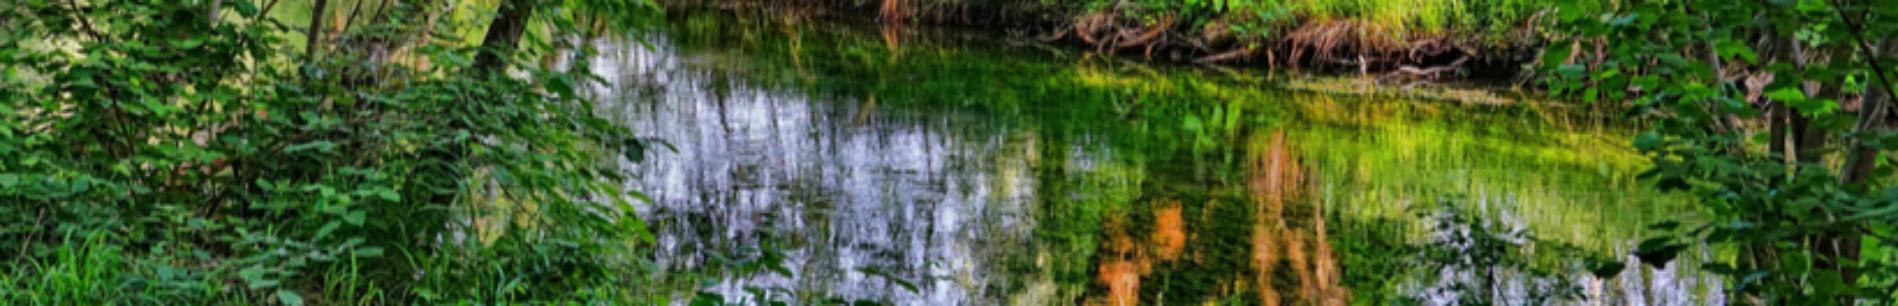 Bandeau eau ©Pixabay-Schwoaze